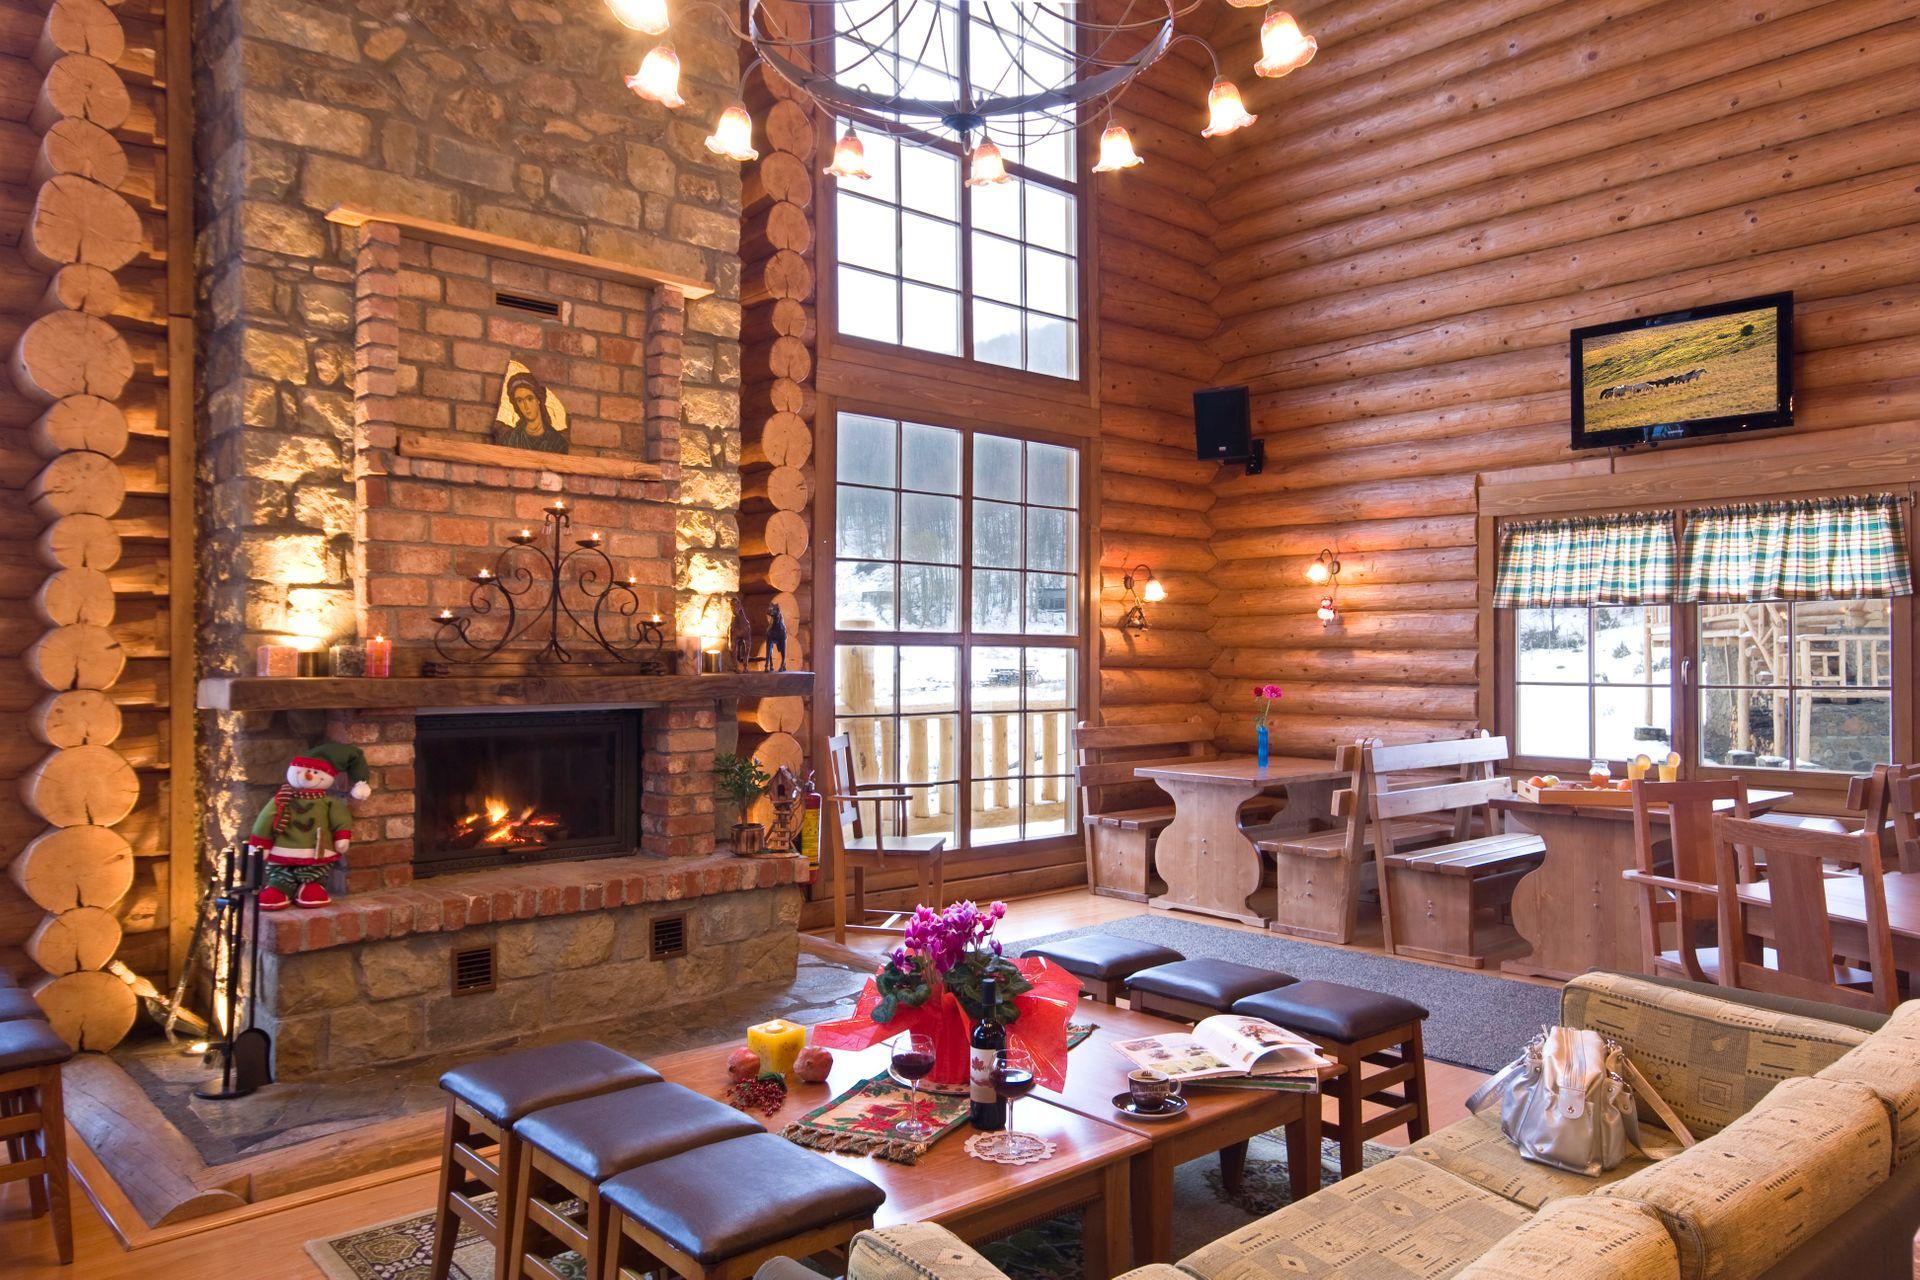 Sfendamos Wood Village - Νάουσα ✦ 3 Ημέρες (2 Διανυκτερεύσεις)